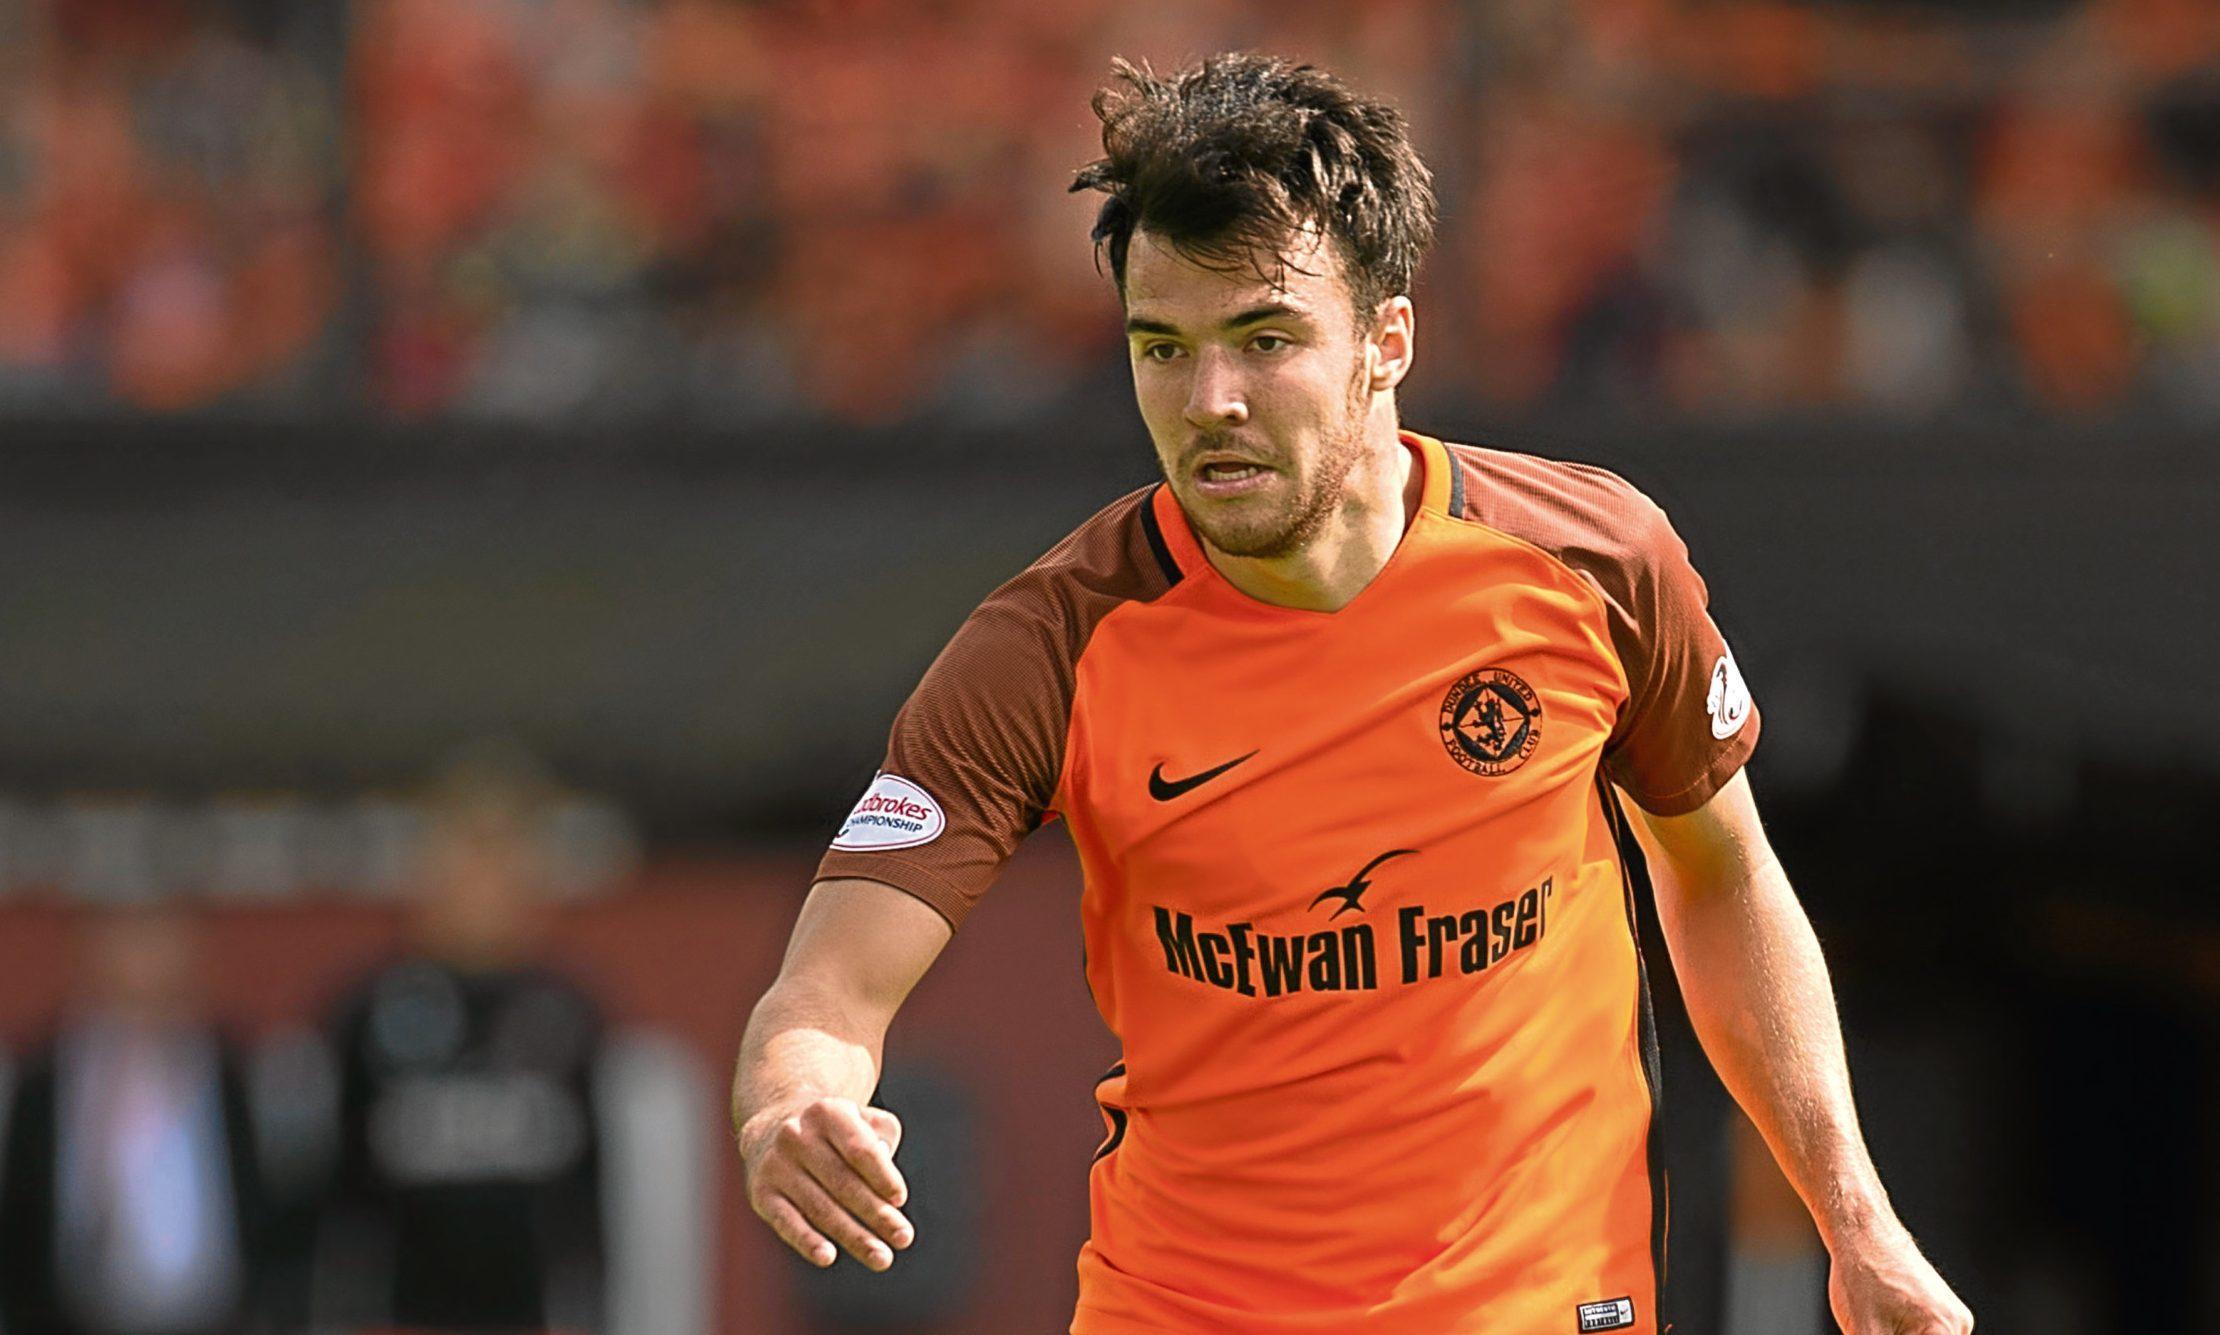 Scott Fraser could make a return for Dundee United.